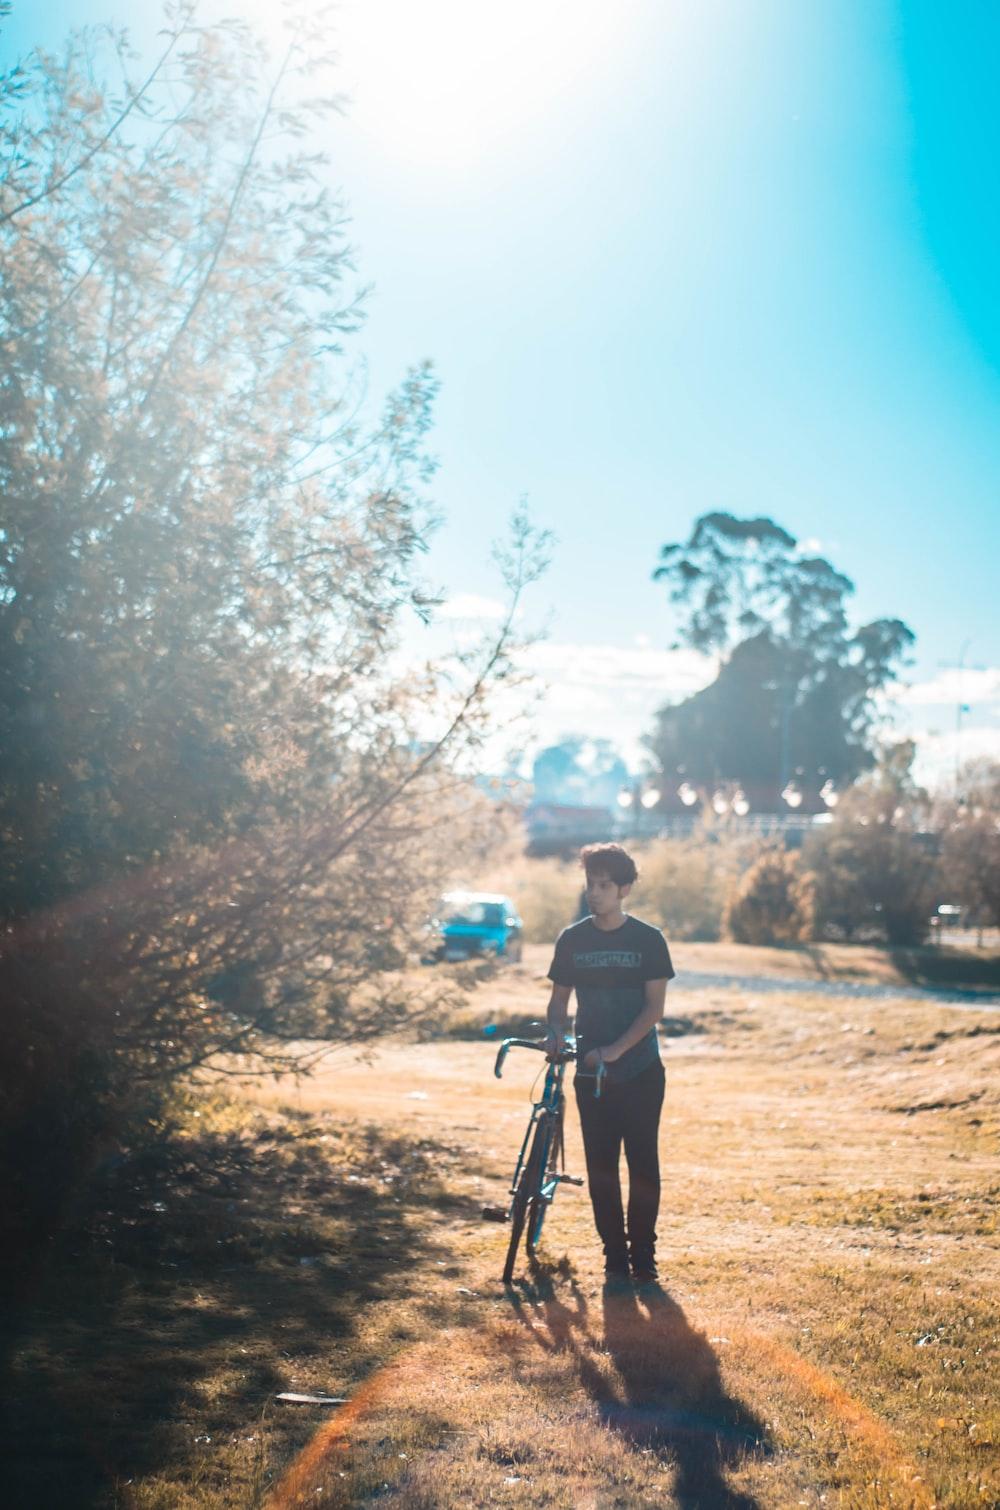 man standing beside bike and tree